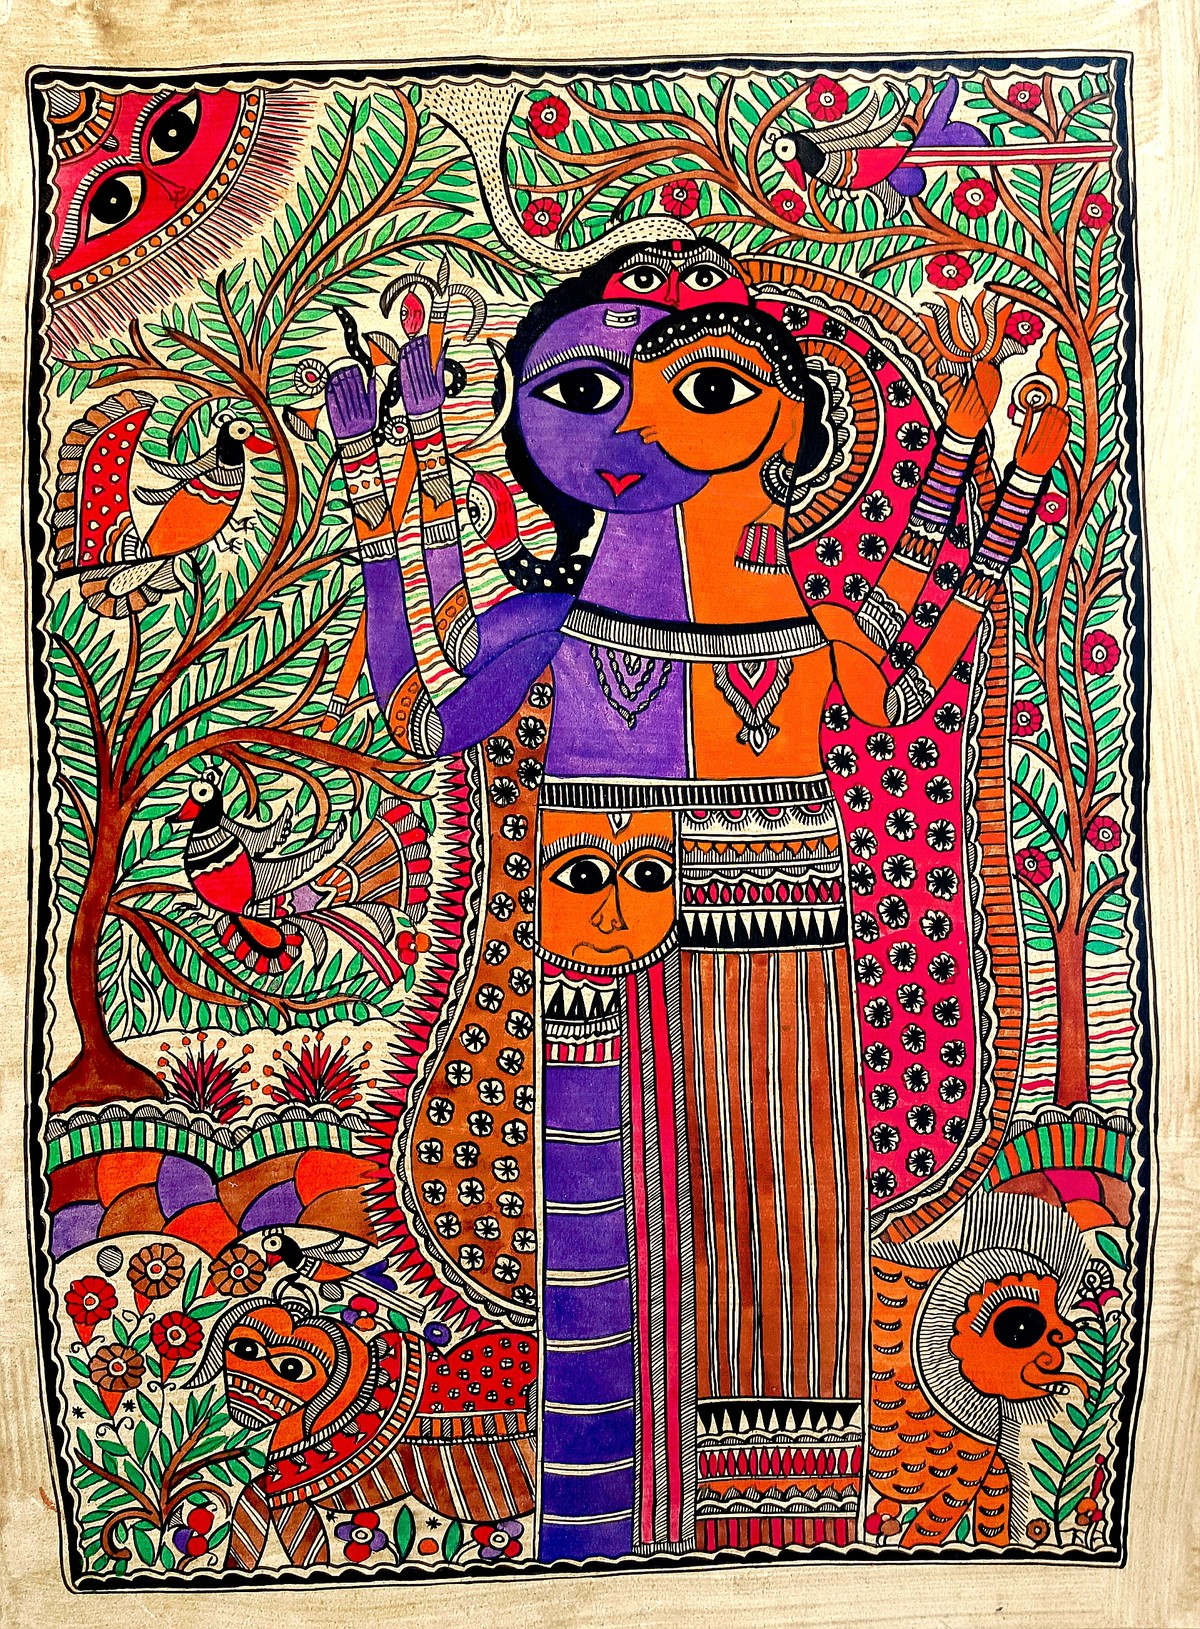 Ardhanarishvara by Chano Devi, Folk Painting, Water Based Medium on Paper, Brown color